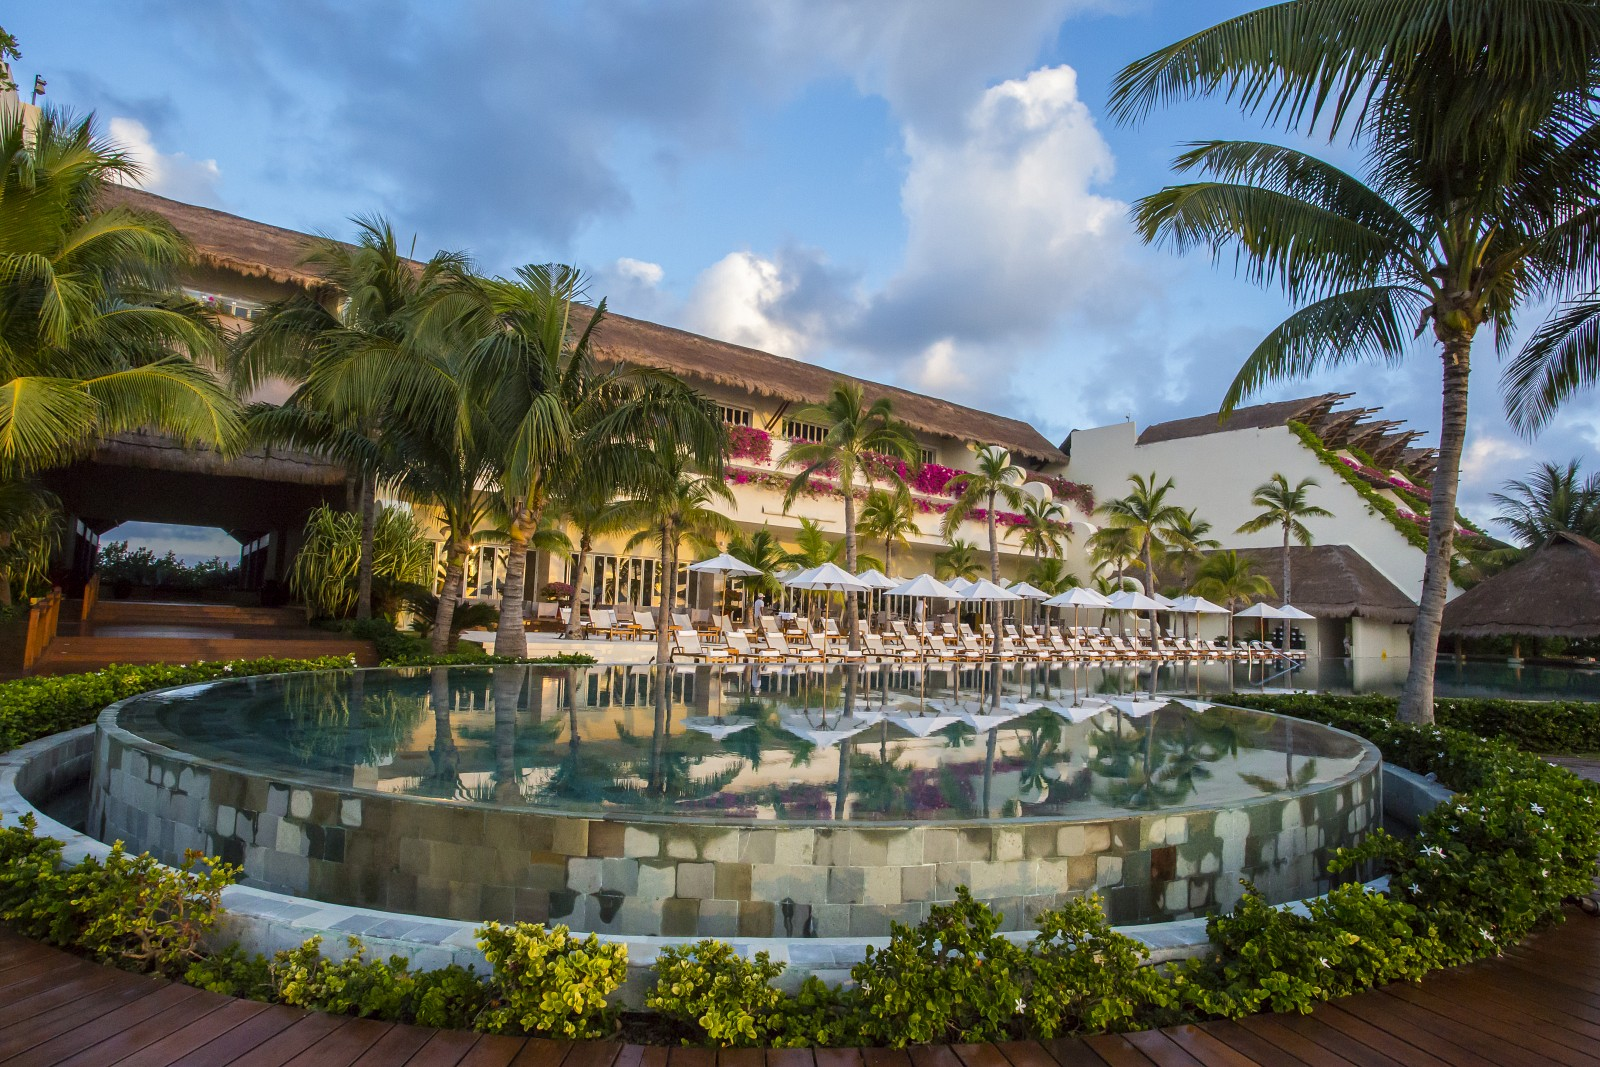 Travel Agency All-Inclusive Resort Grand Velas Riviera Maya 006